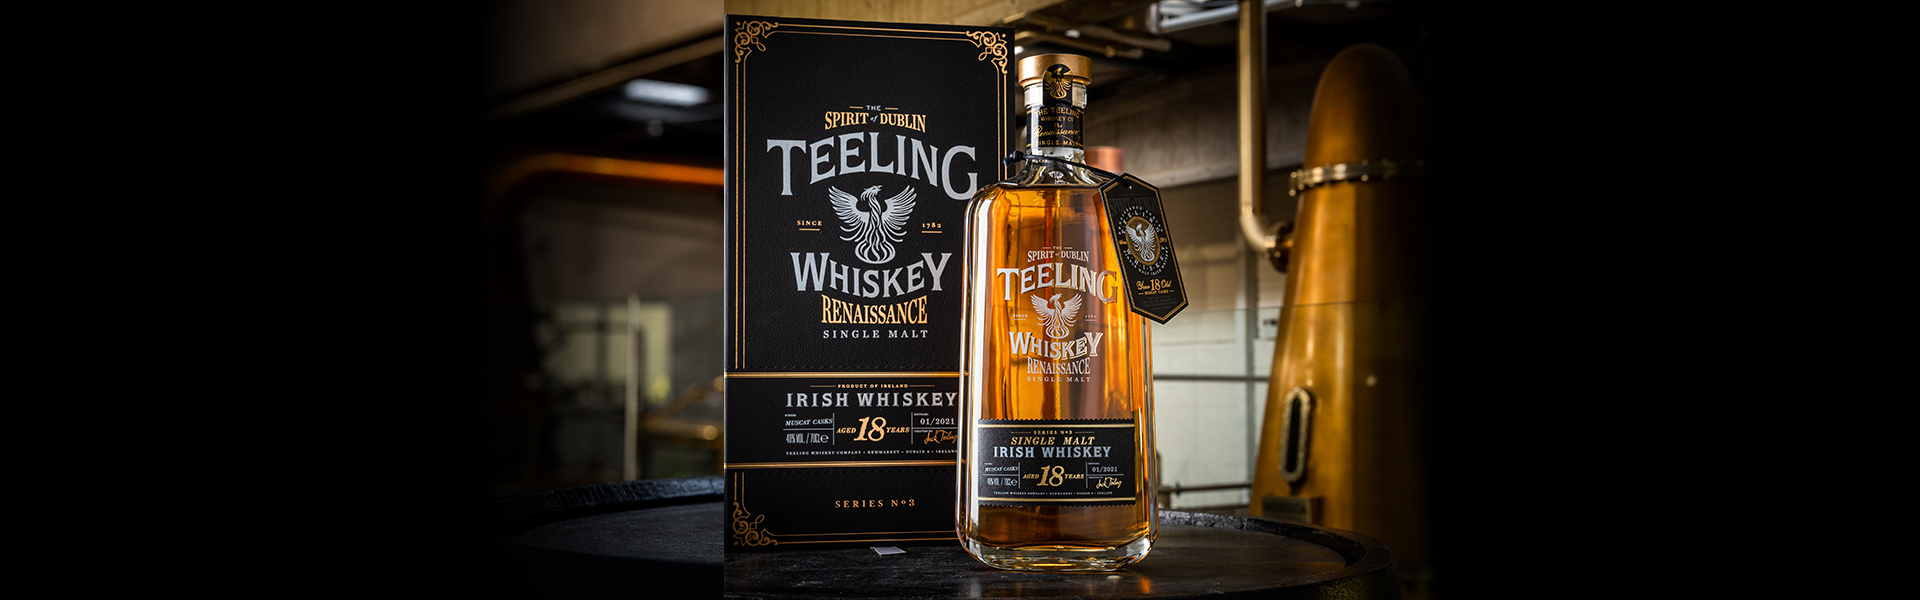 Teeling Renaissance Series 3 Single Malt Whiskey Muscat Cask 18 Years Old